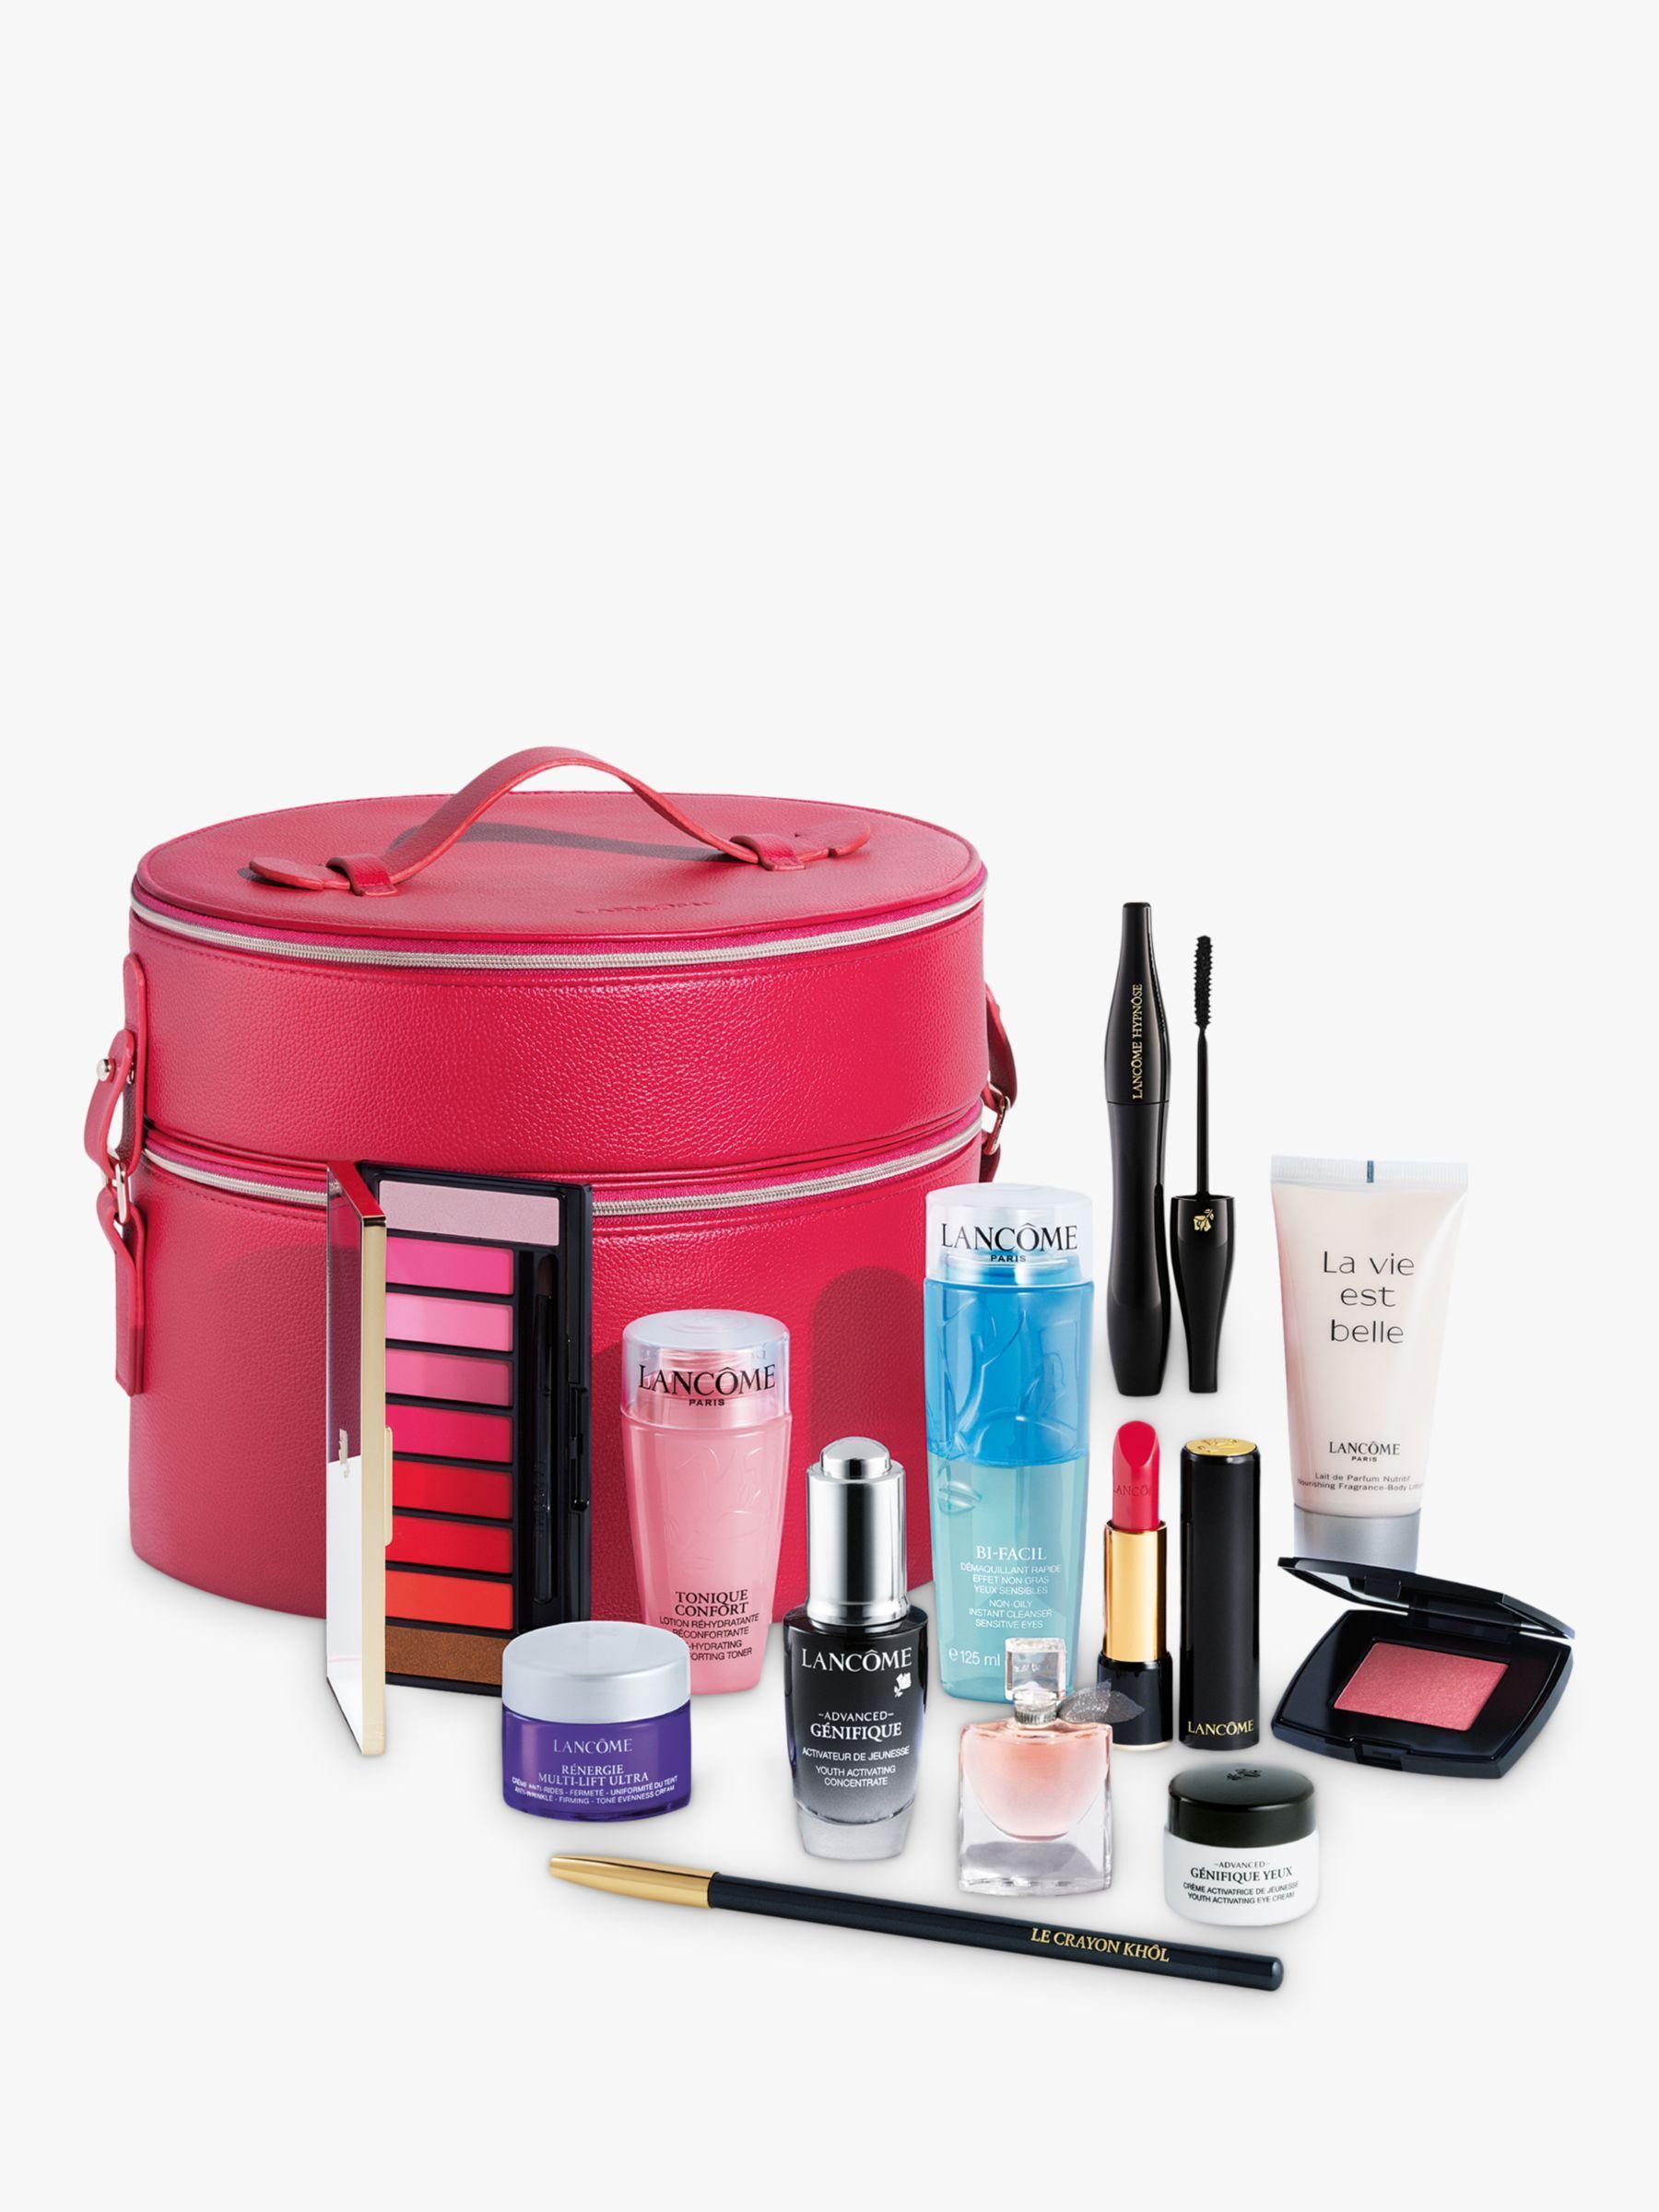 Lancôme Beauty Box Gift Set gift set, Beauty box